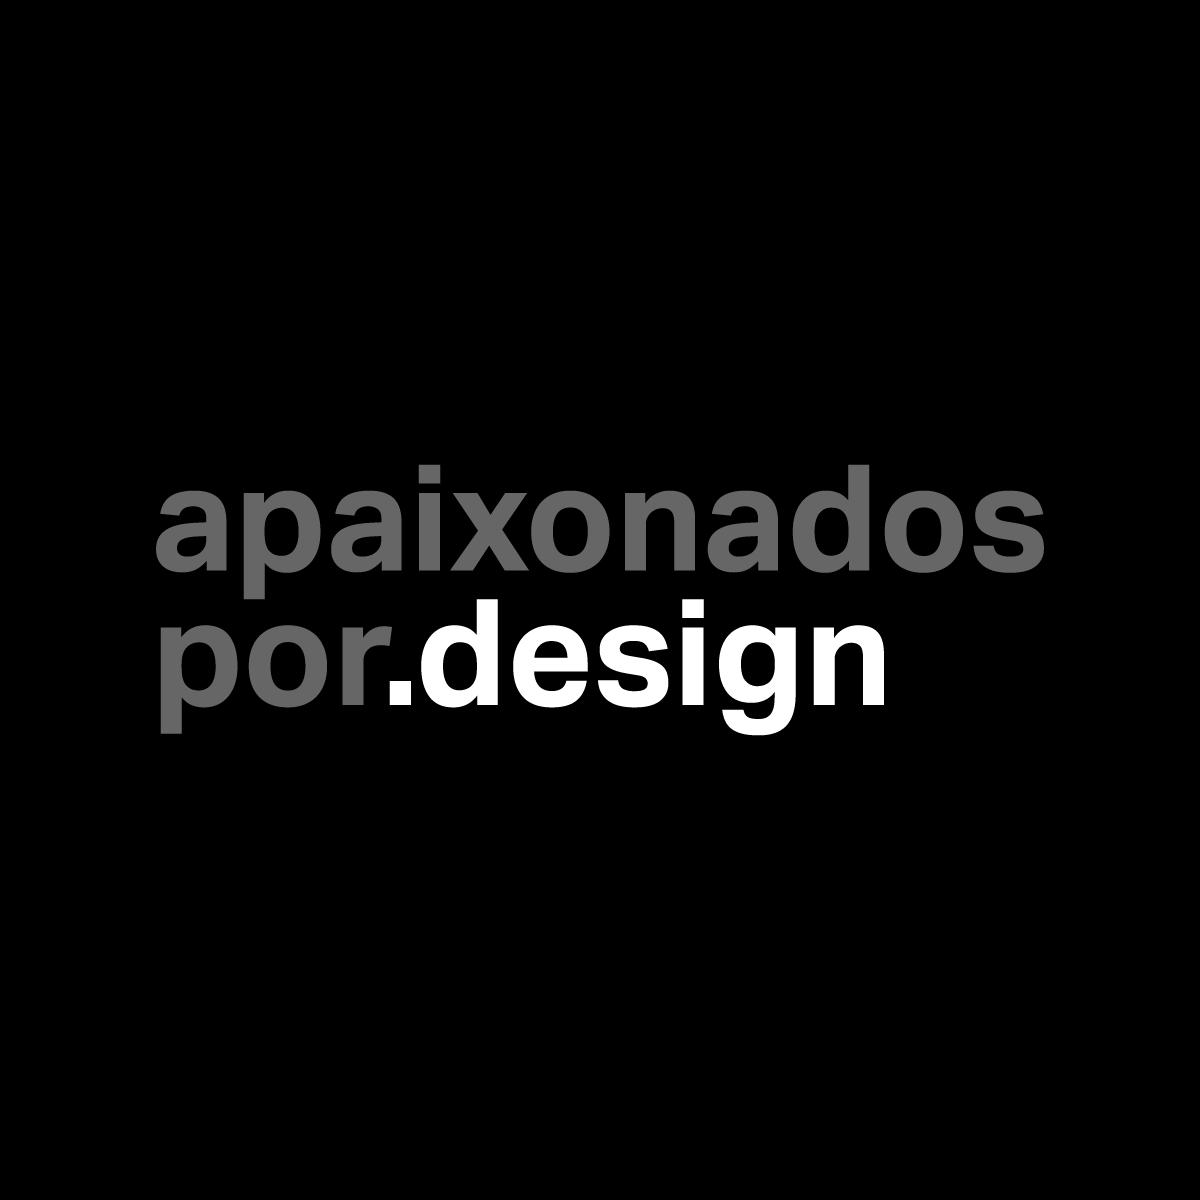 Apaixonados por Design - designer Jandreh Hofstetter